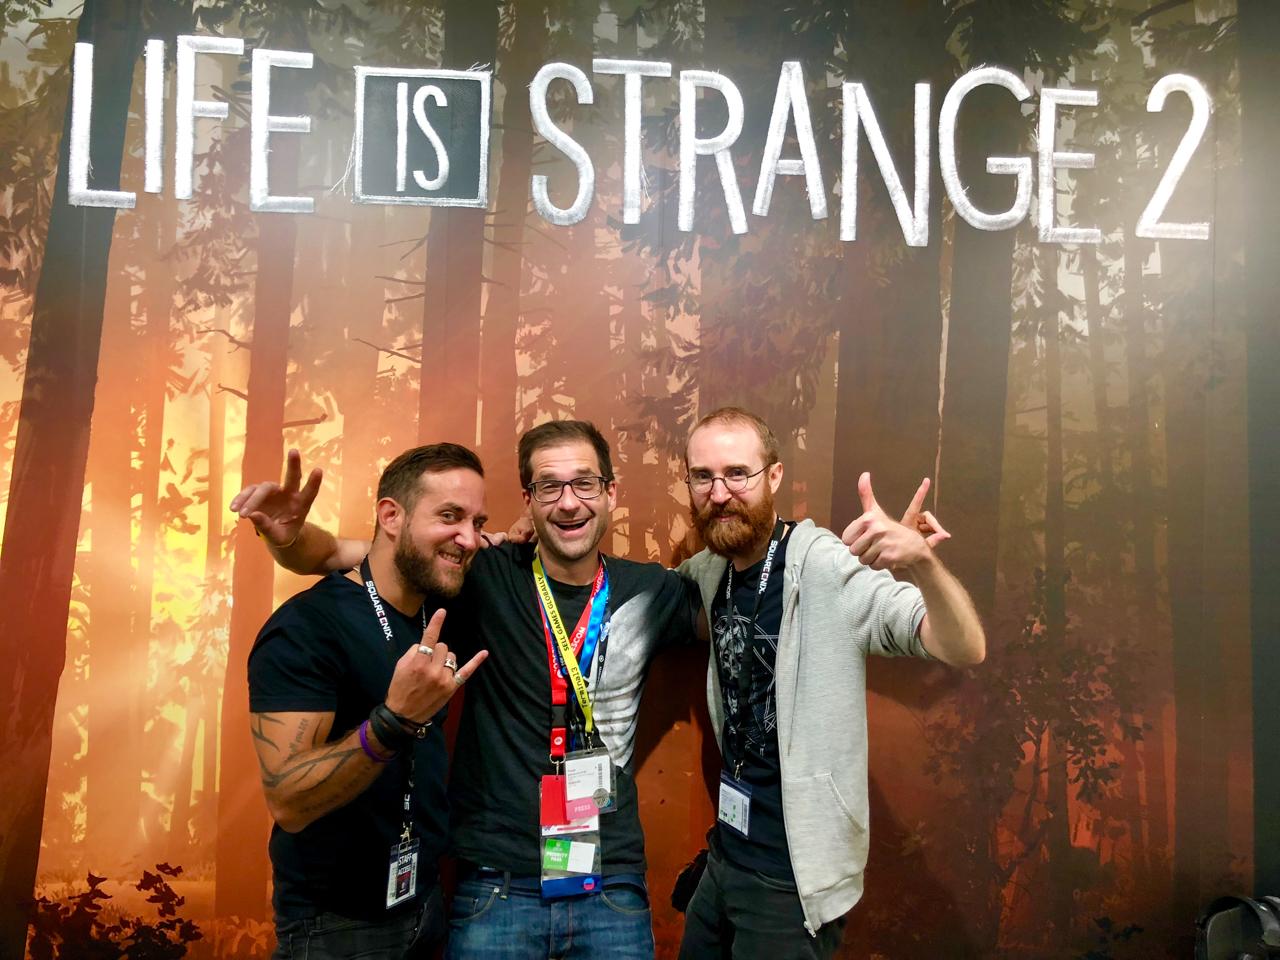 Life Is Strange Developer bei der gamescom 2018 in Köln